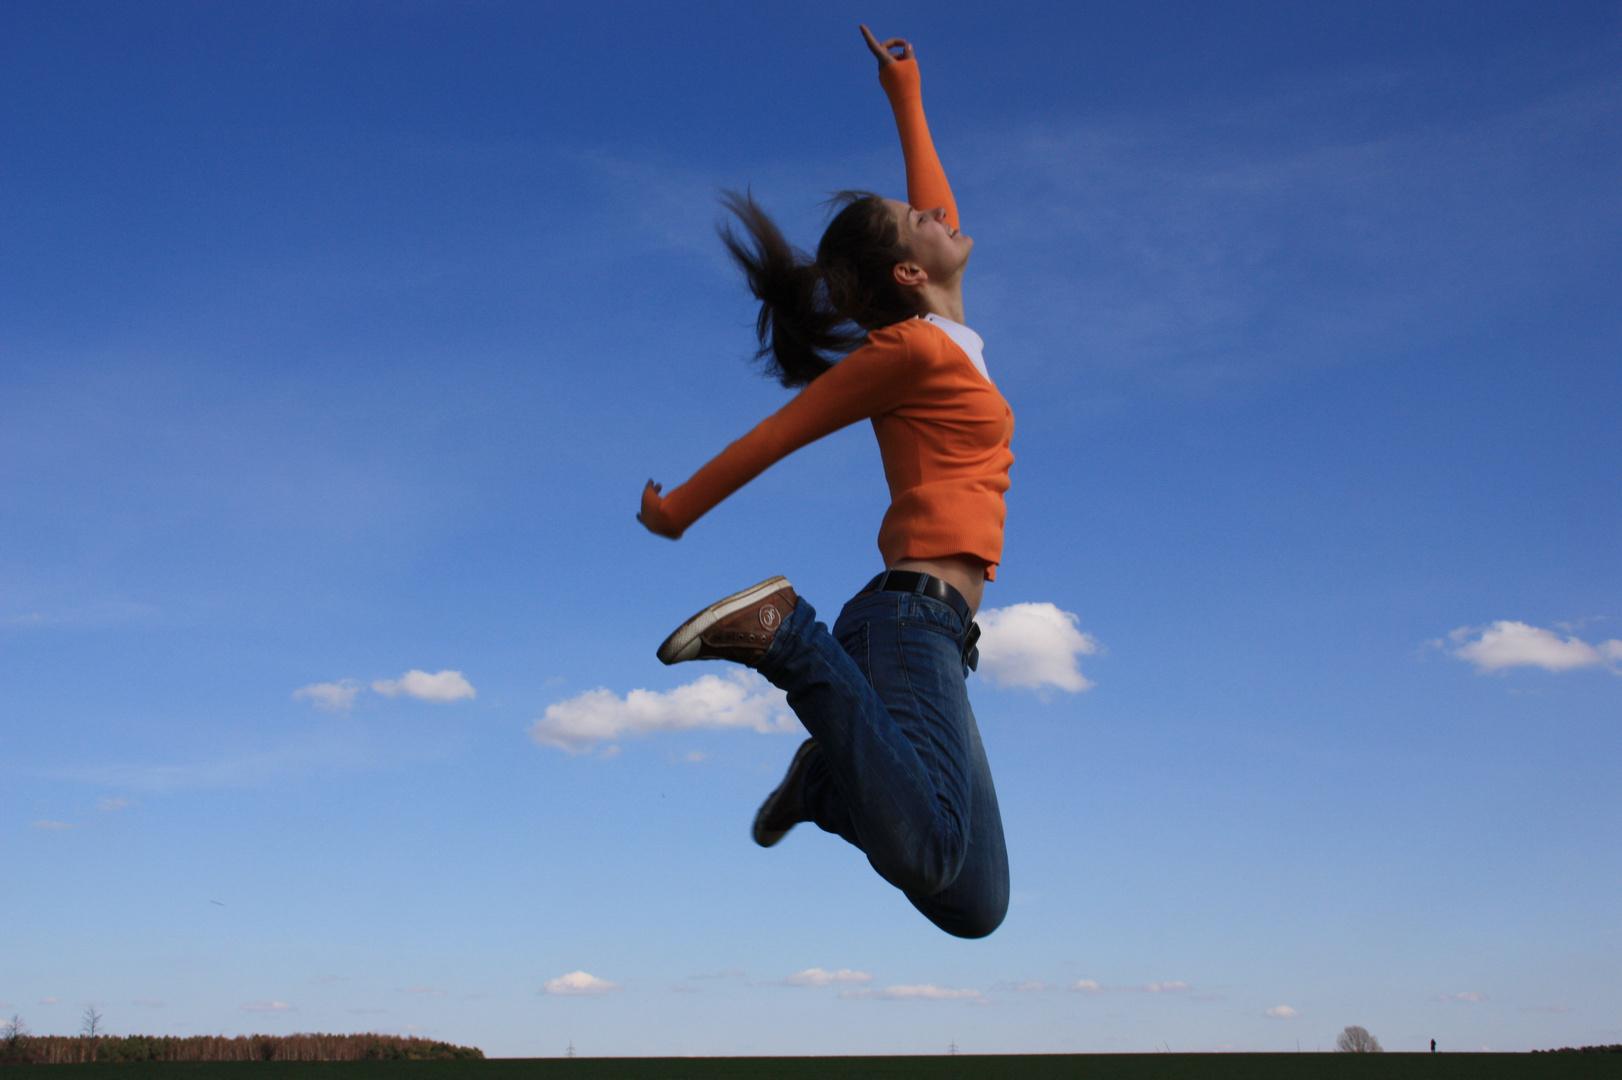 When I say jump